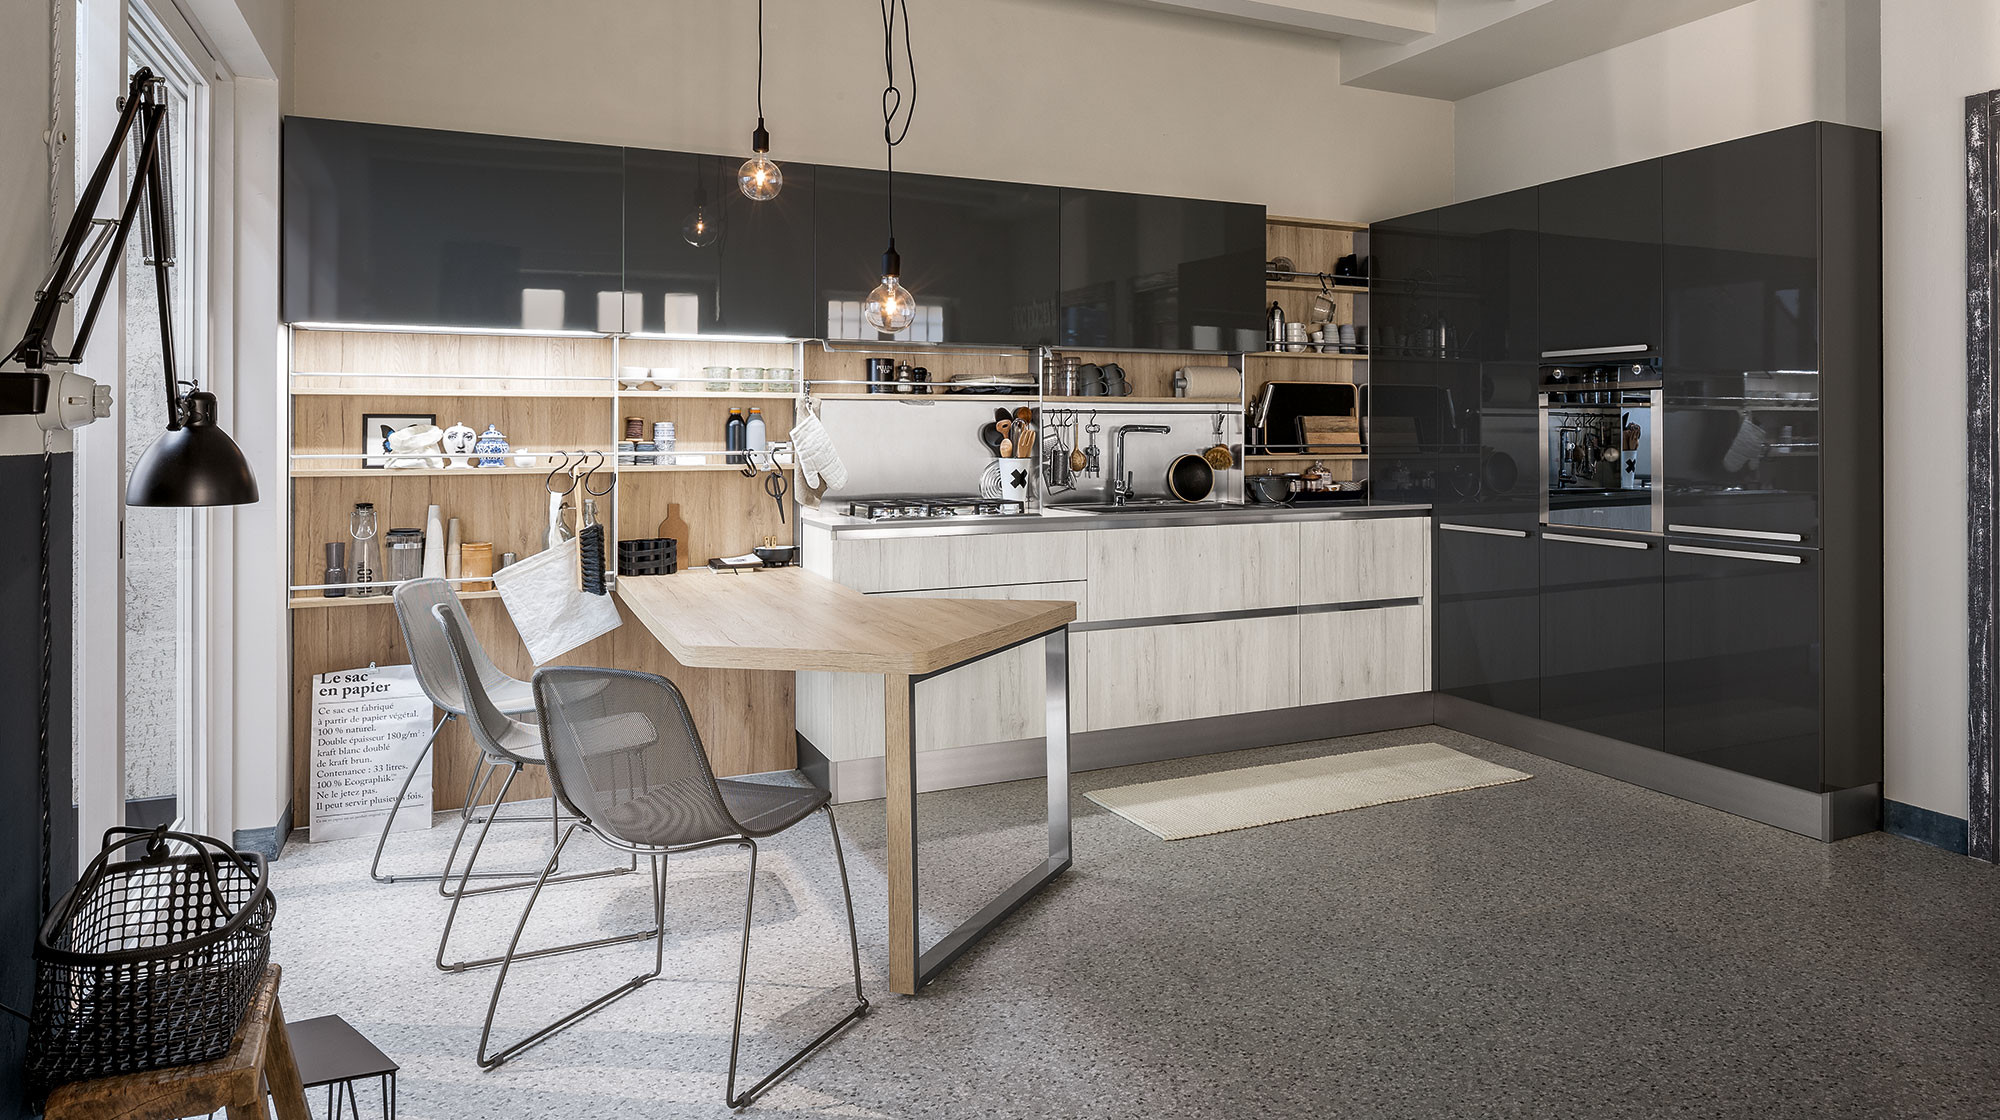 Opinioni Veneta Cucine Start Time.Cucina Start Time Veneta Cucine